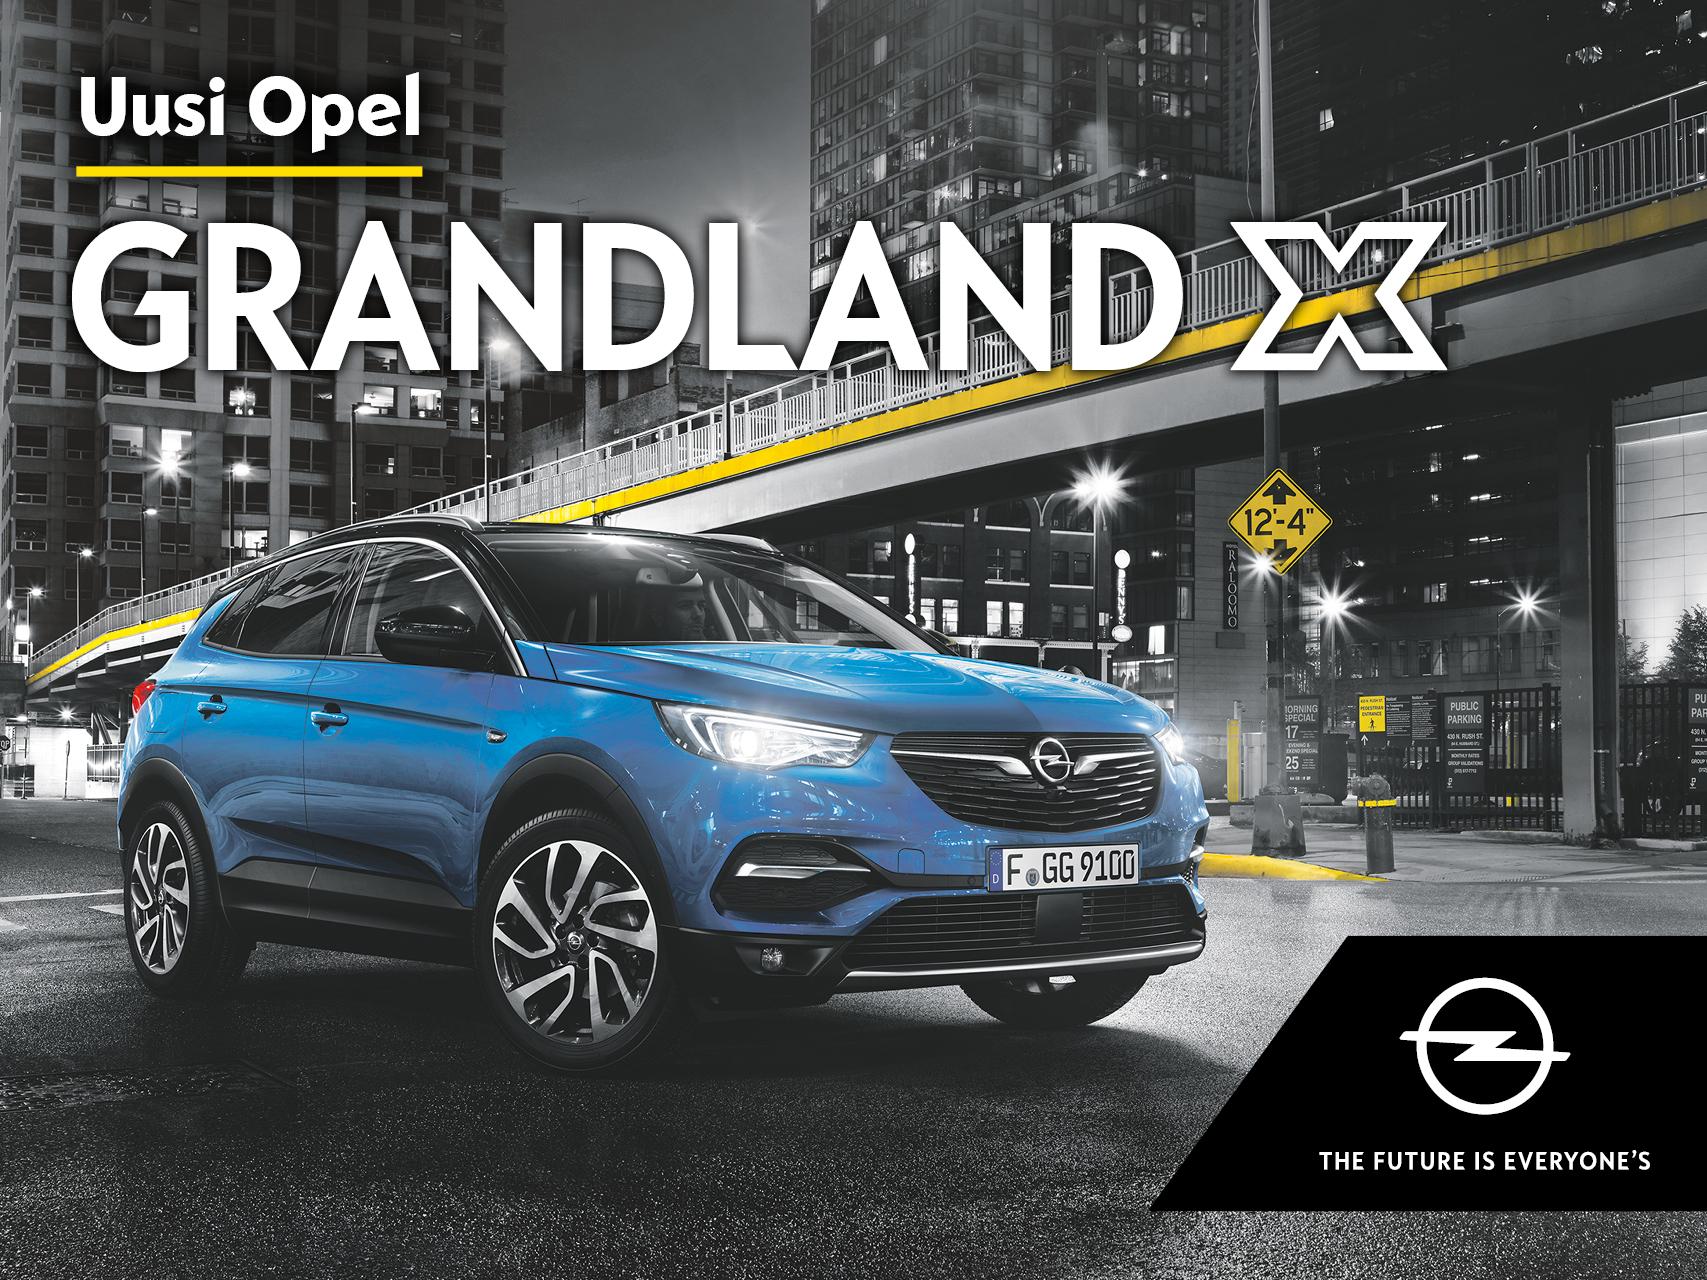 Ensiesittelyssä: Opel Grandland X